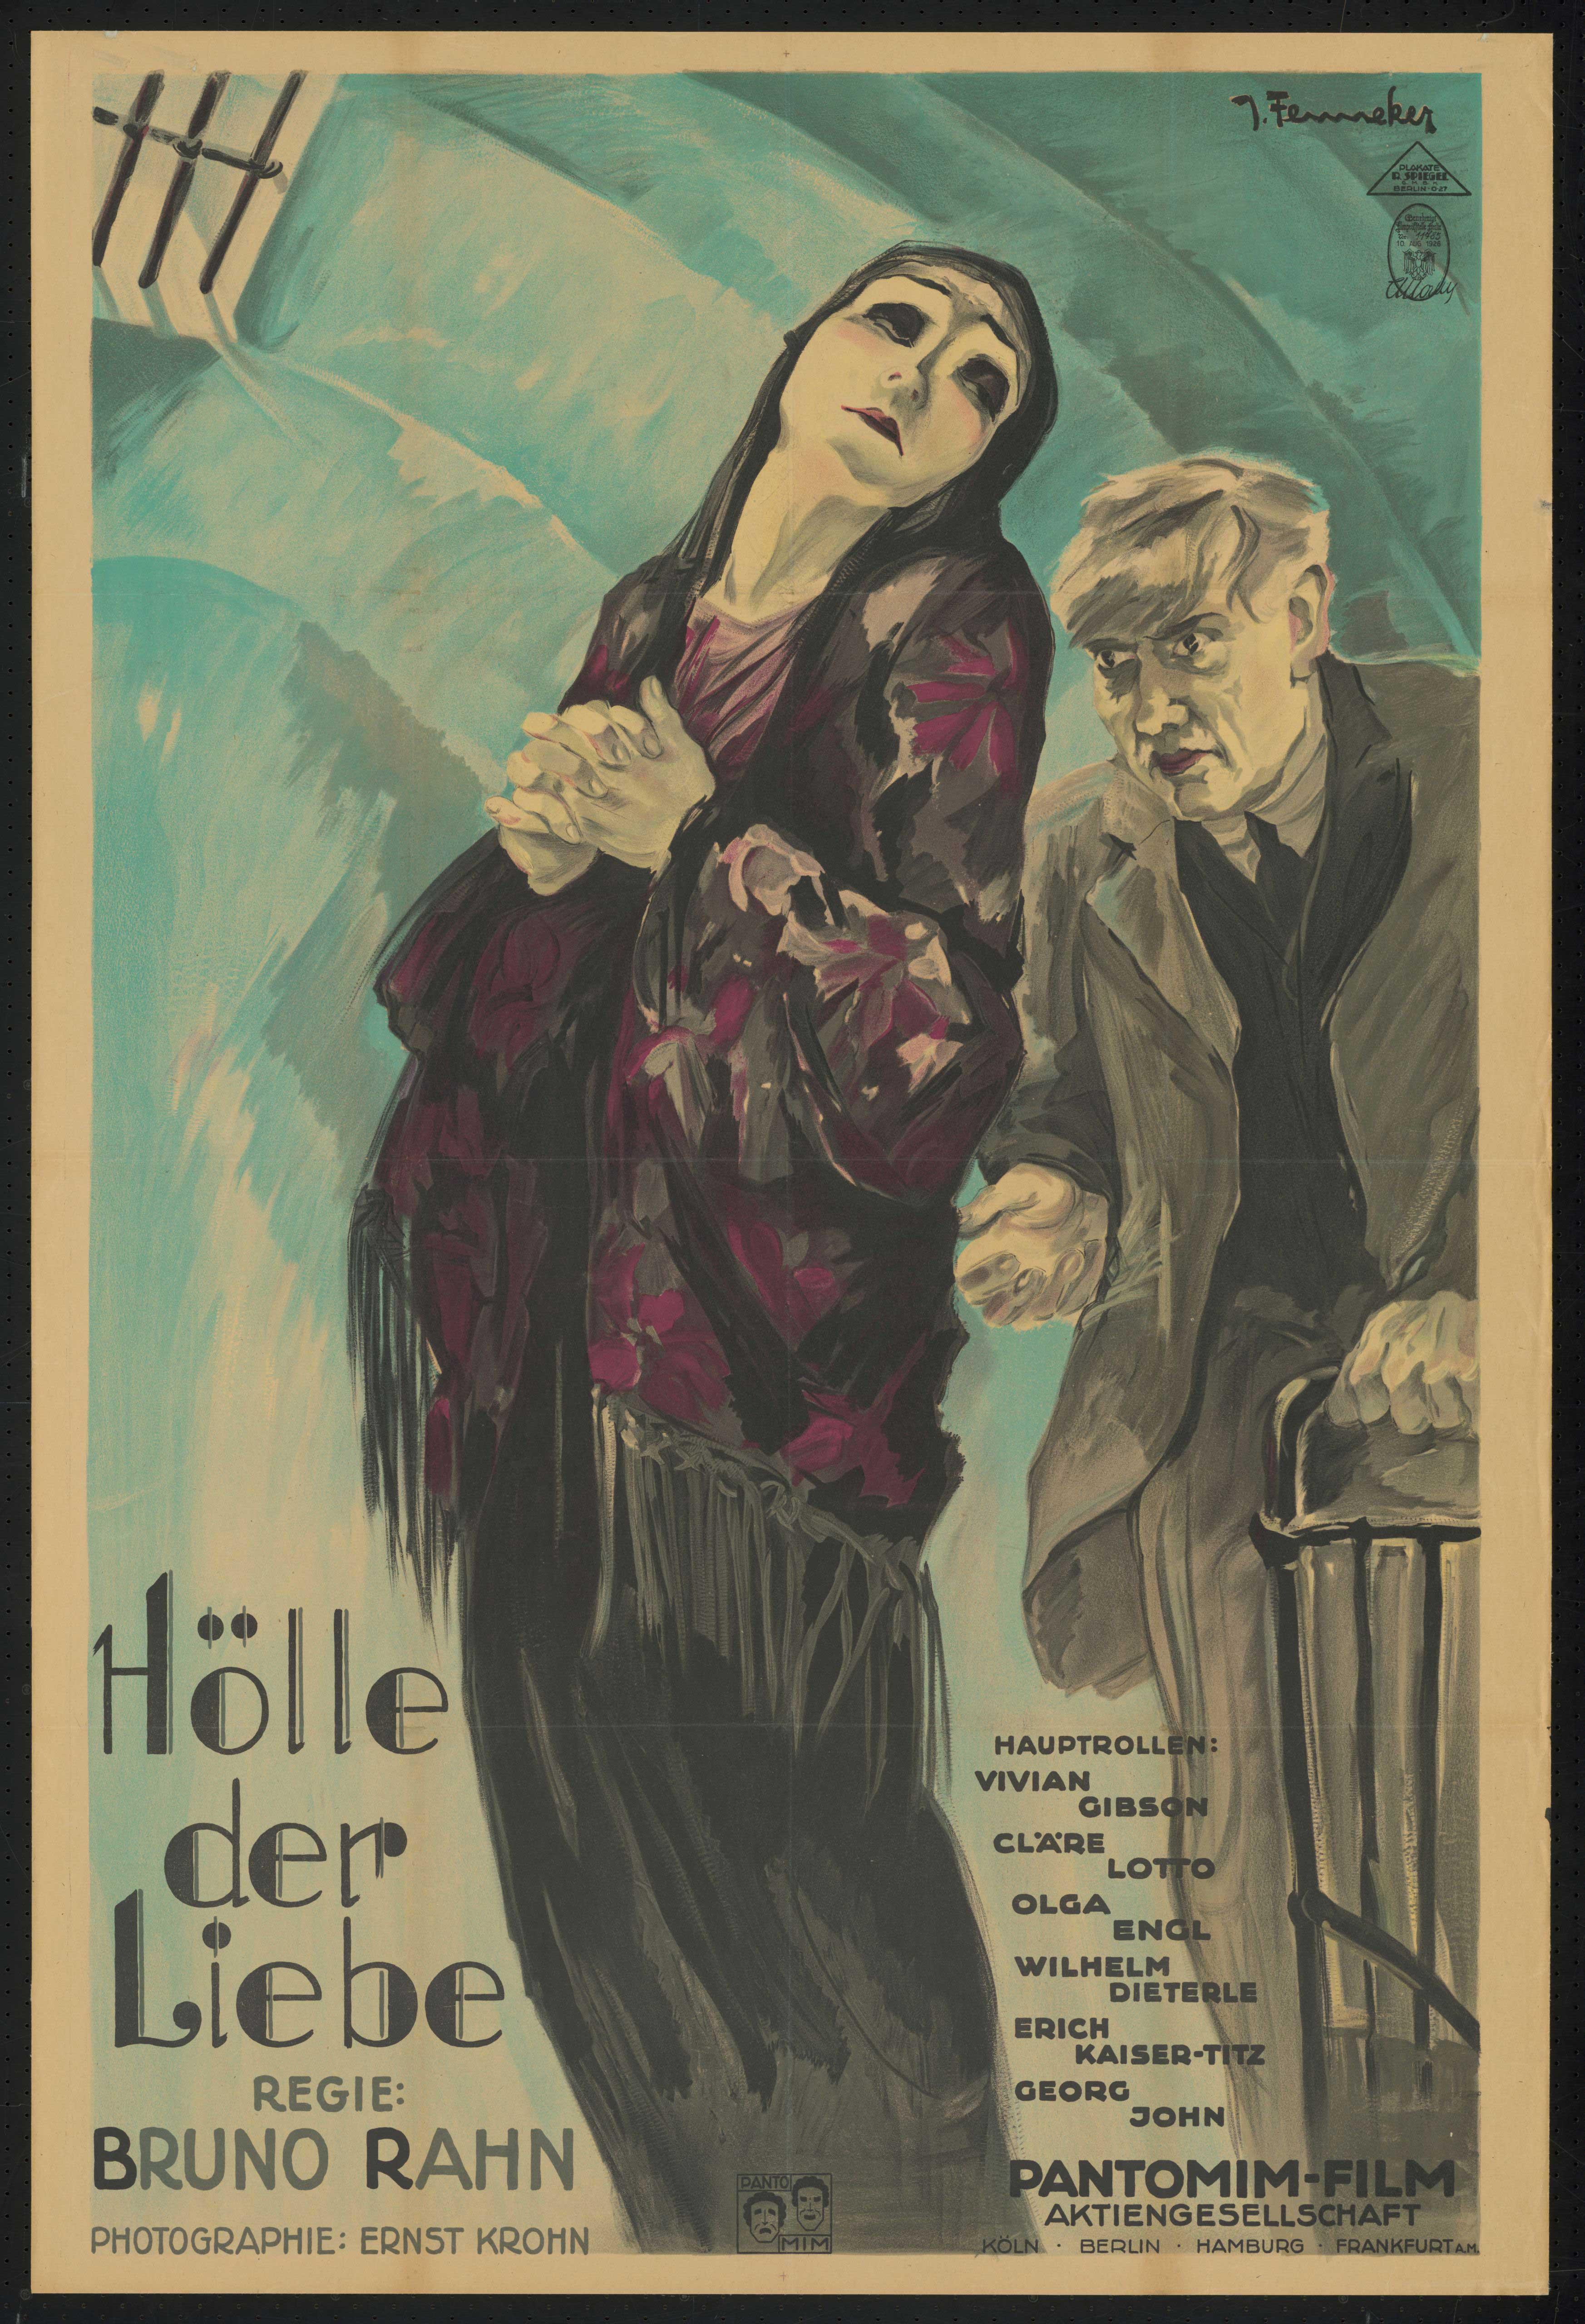 Film poster by Joef Fenneker: Hölle der Liebe, Germany 1926, directed by Bruno Rahn